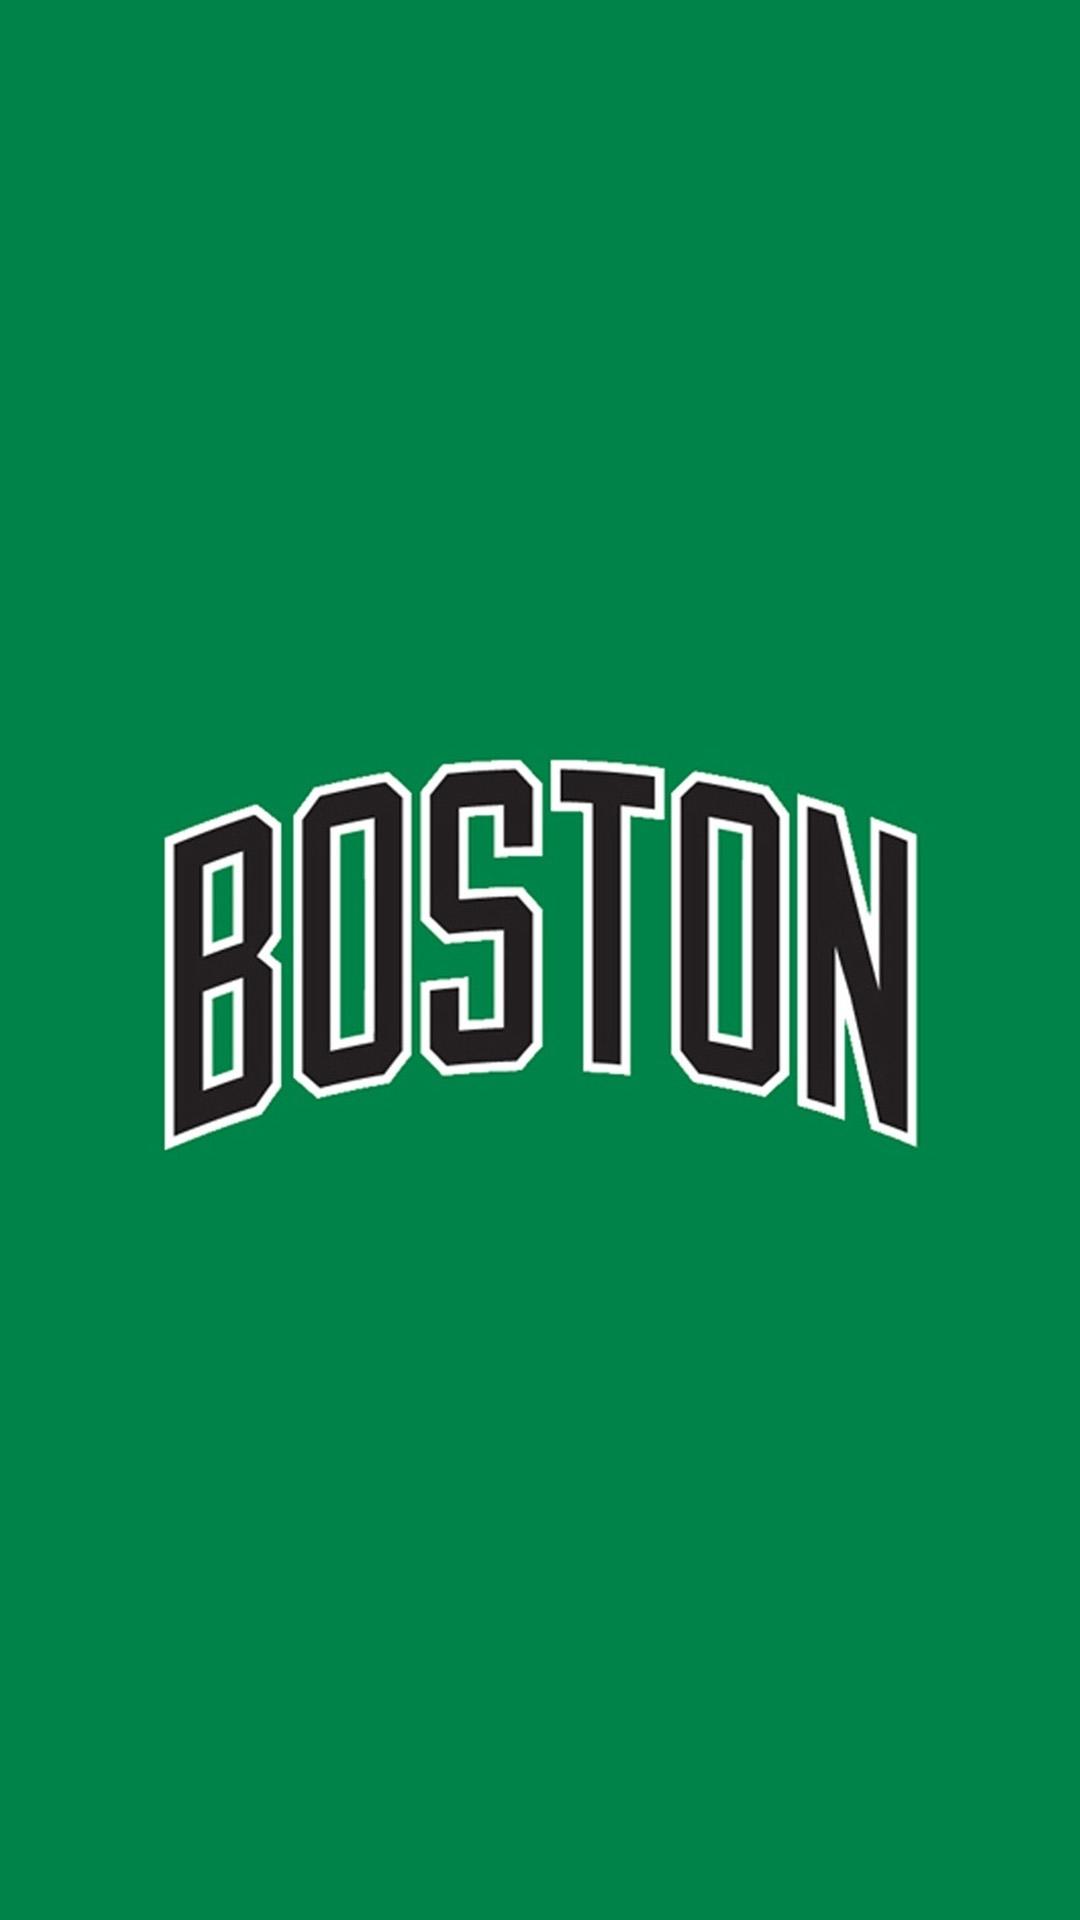 boston celtics wallpaper for android | 1080x1920 | image id 3482